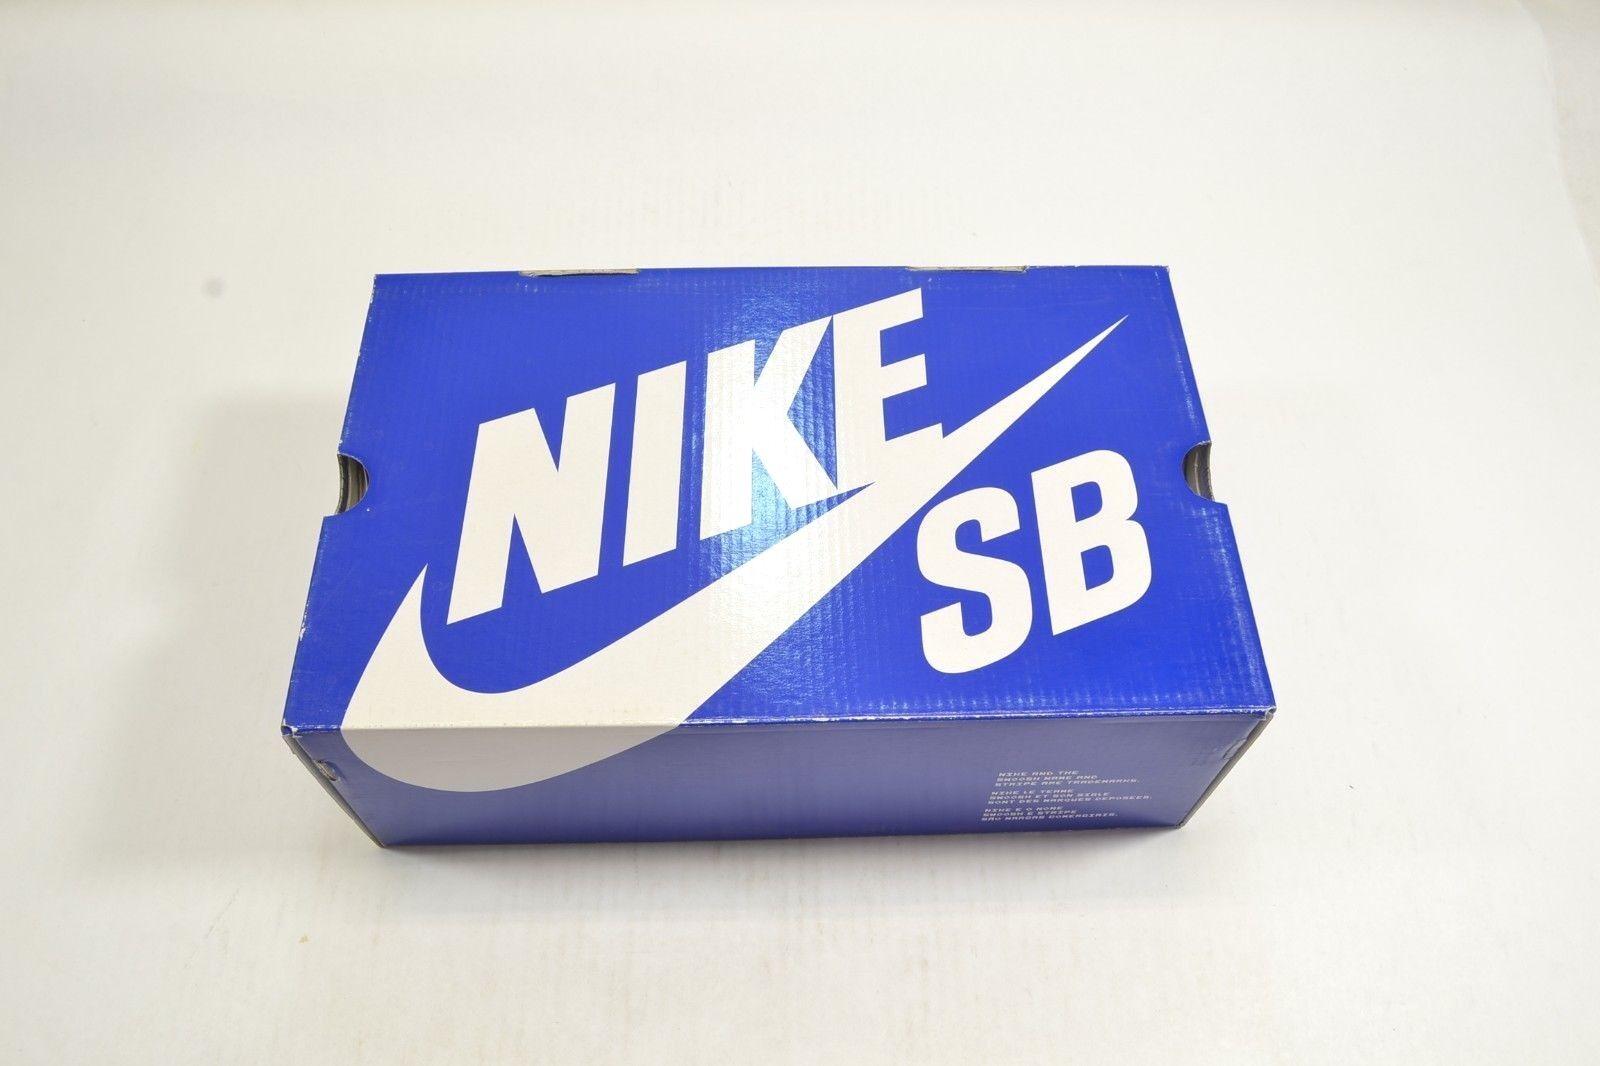 Nike PREMIUM ZOOM STEFAN JANOSKI PREMIUM Nike noir noir-blanc 375361-002 (D) homme chaussures 928614